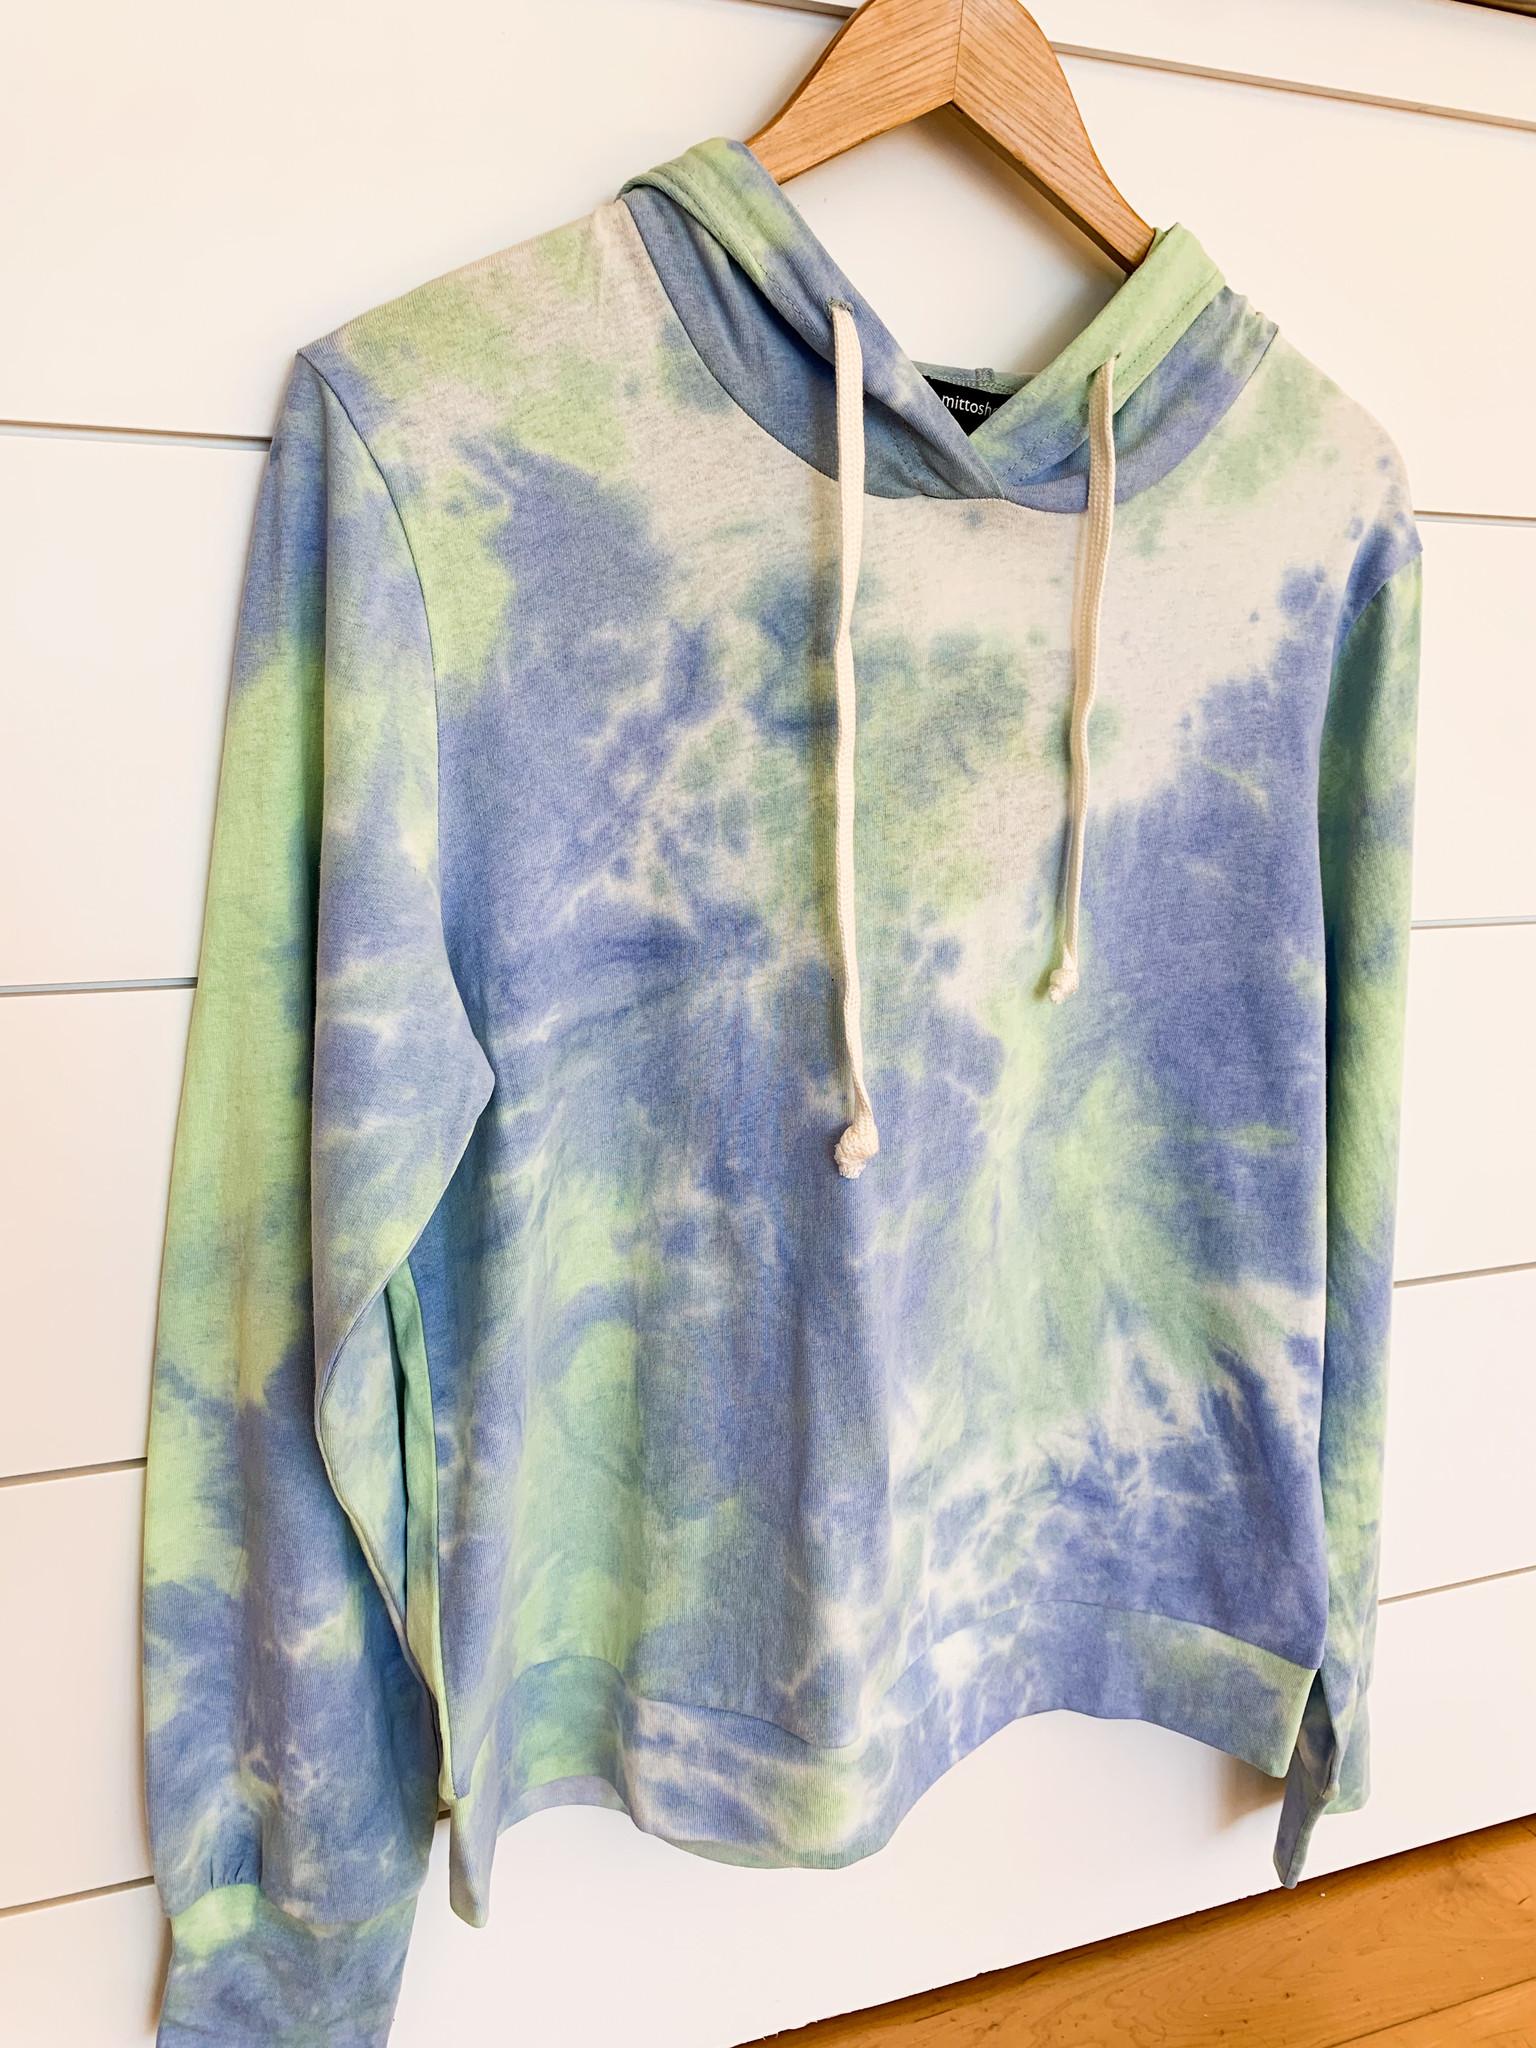 Mittoshop Green Multi Tie Dye Long Sleeve Hooded Top